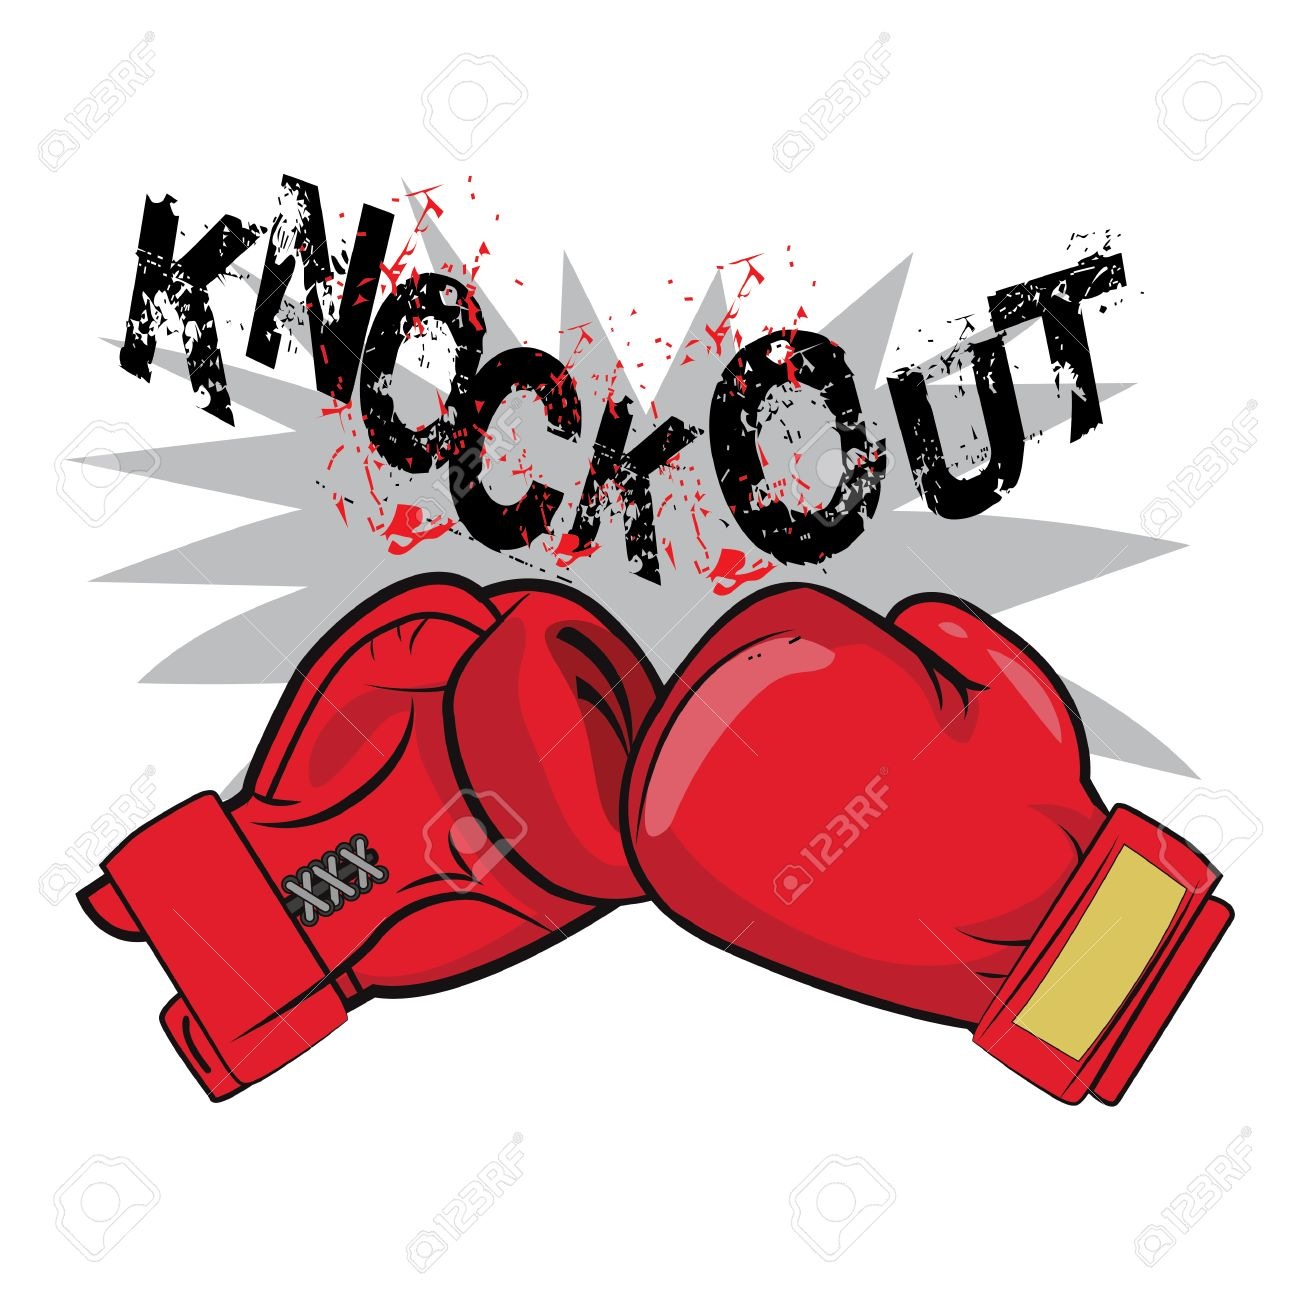 guantes de boxeo y de texto knock out boxeo emblema de la